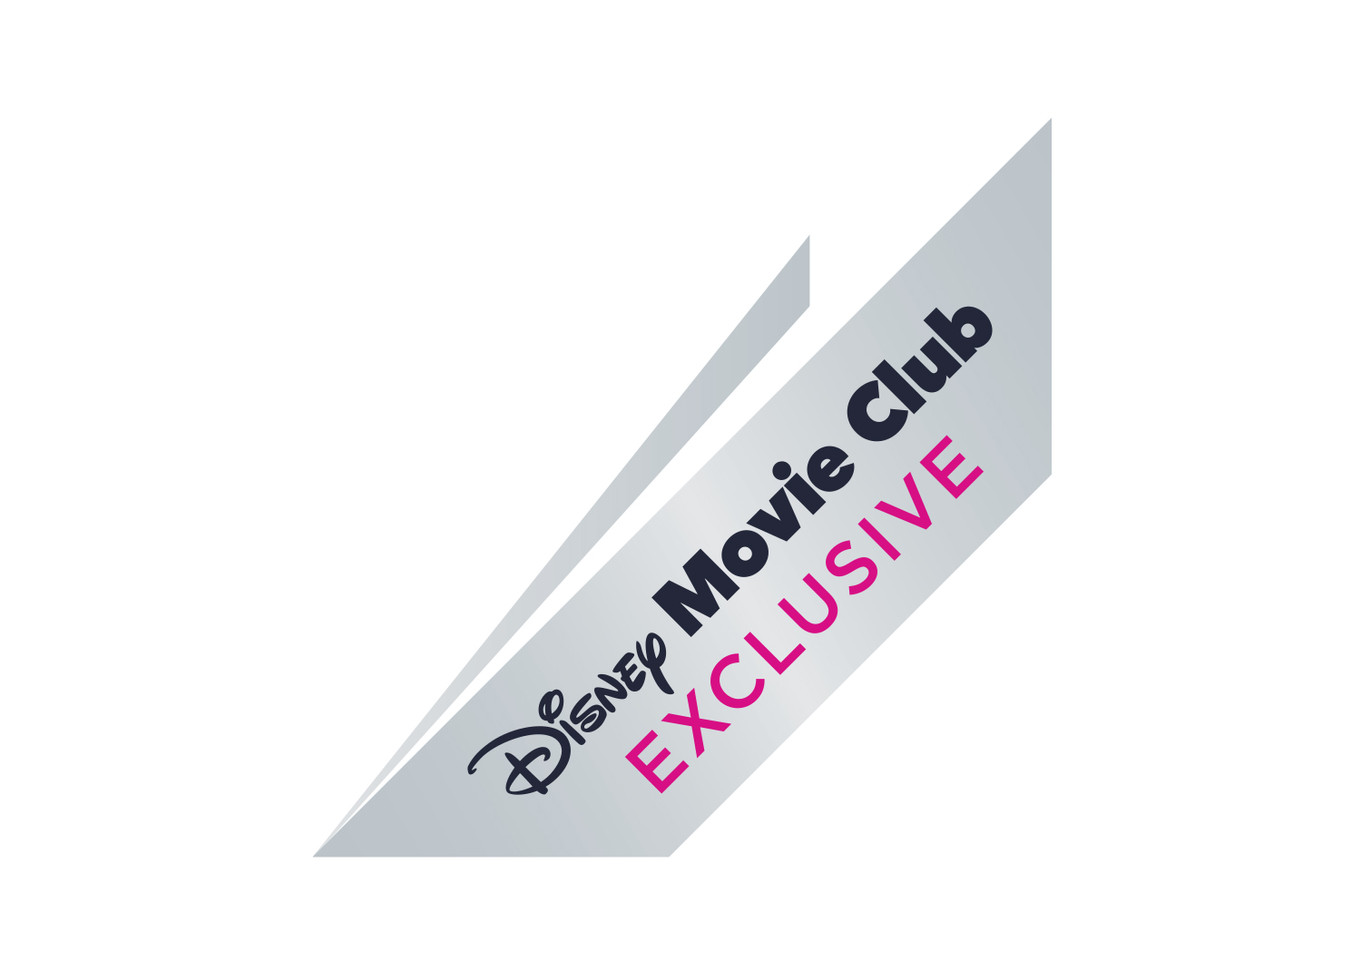 DISNEY MOVIE CLUB SEAL